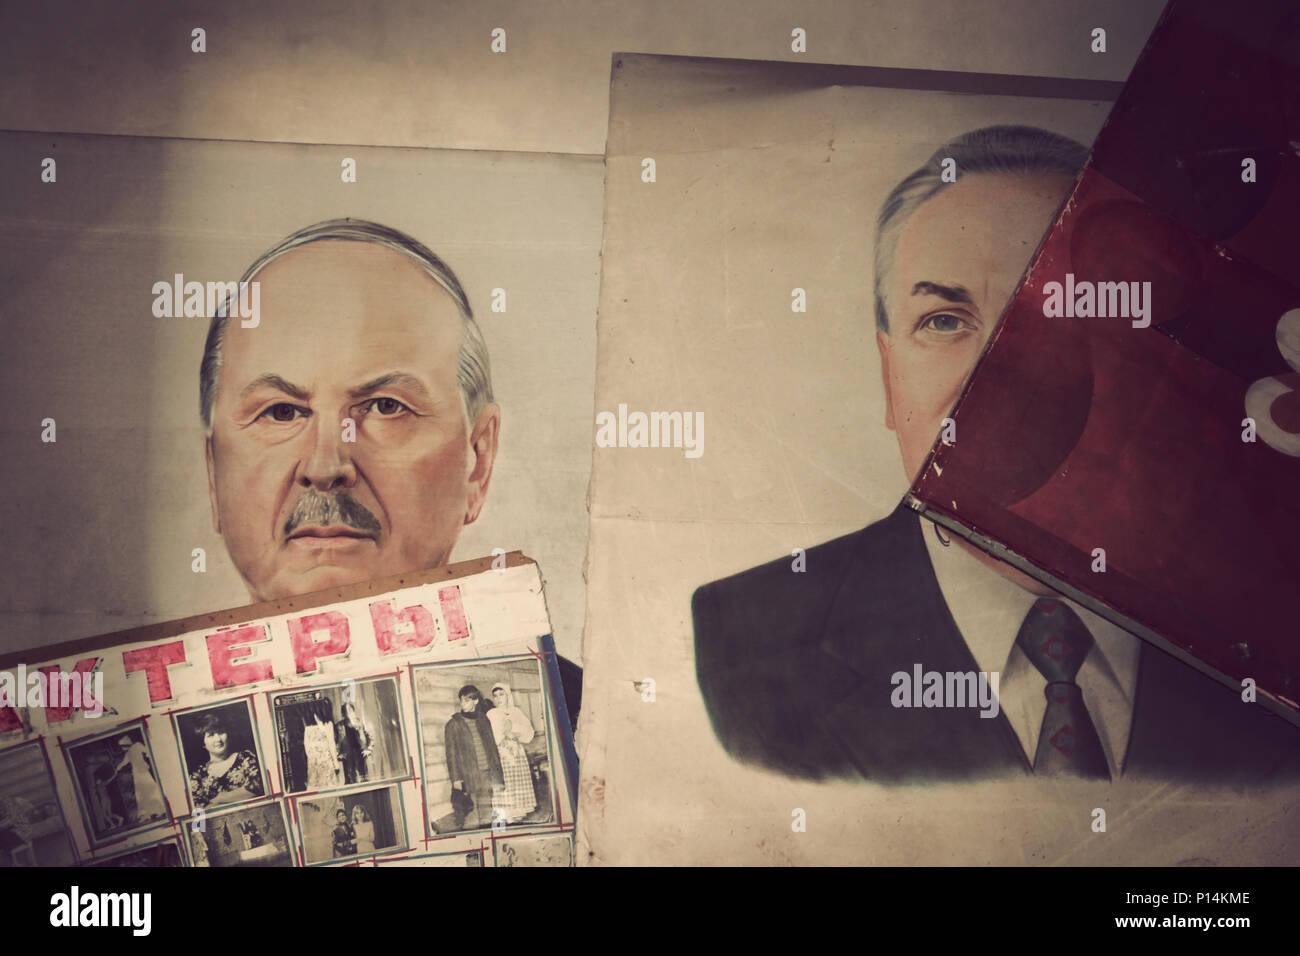 Old soviet propaganda stuff. Abandoned City of Pripyat, Chernobyl, Ukraine. - Stock Image